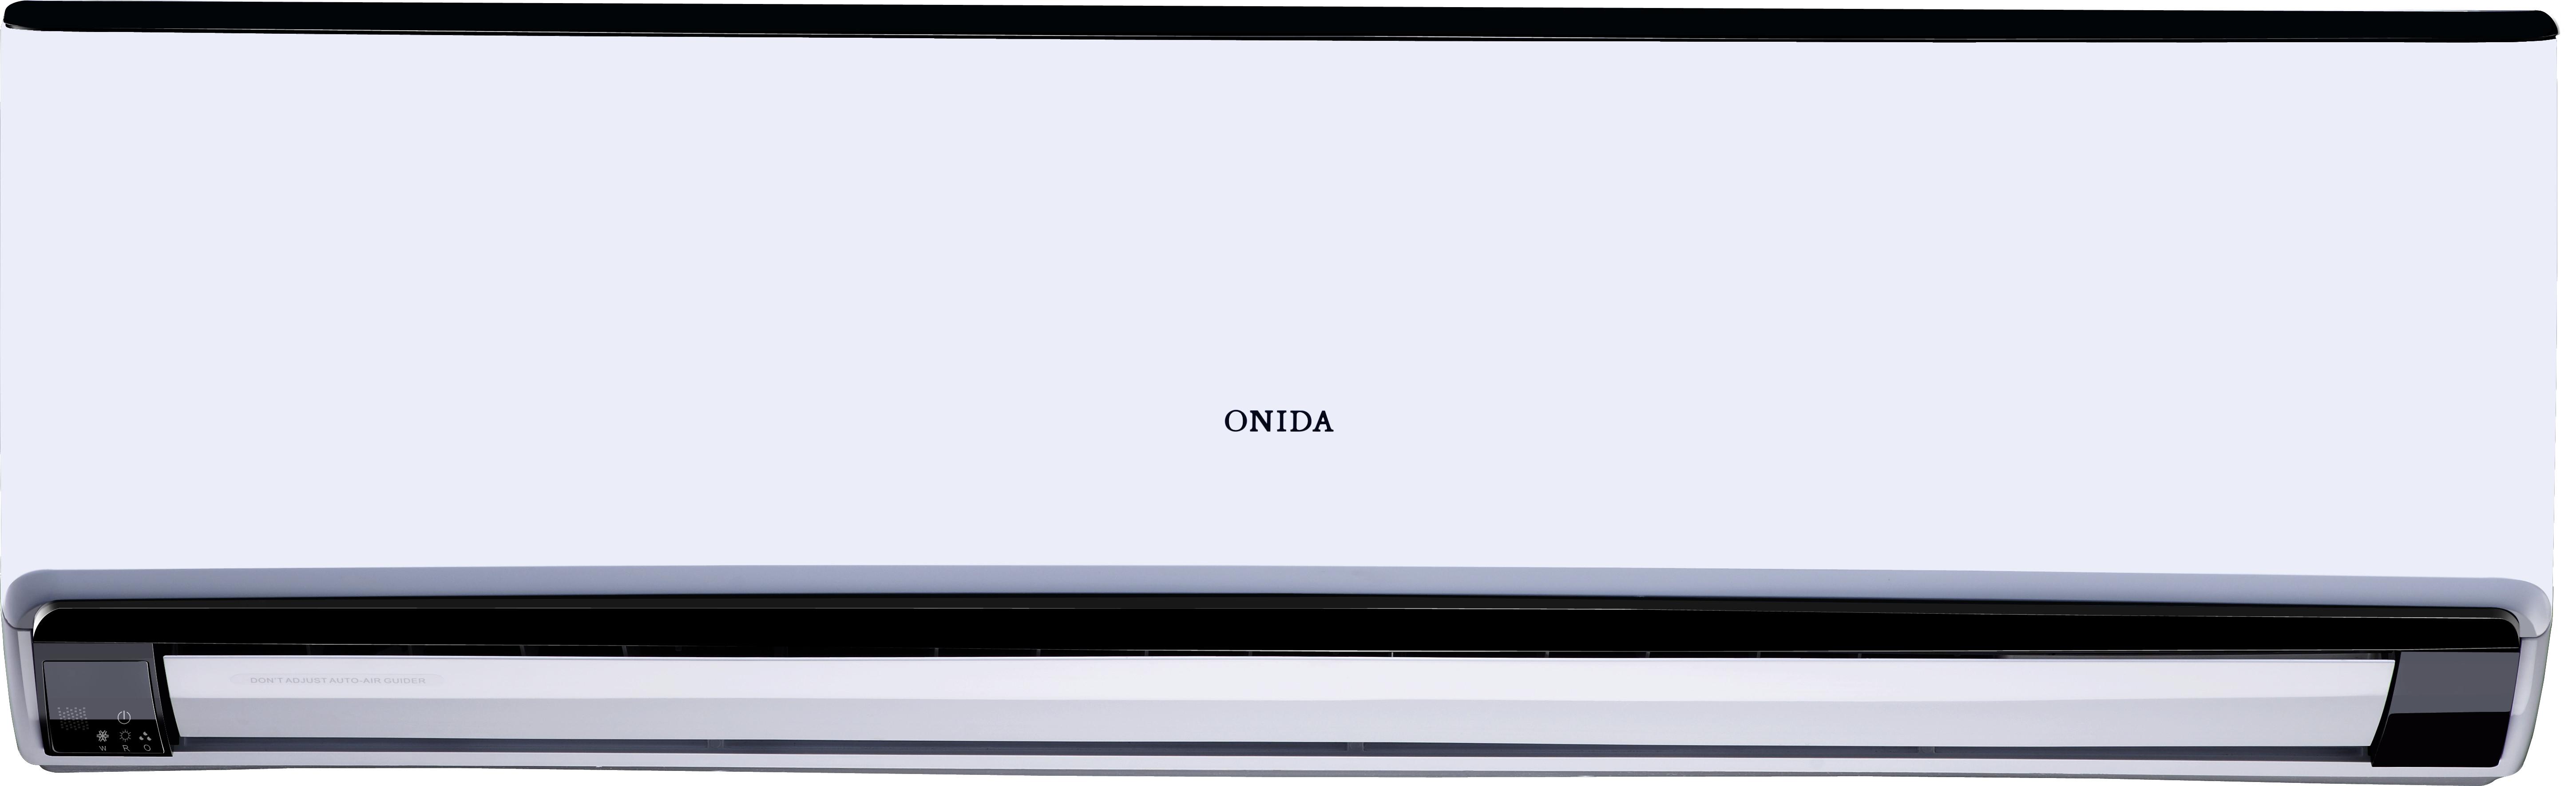 Split AC Price in India Buy Onida S123CUR 1 Ton 3 Star Split AC #404B8B